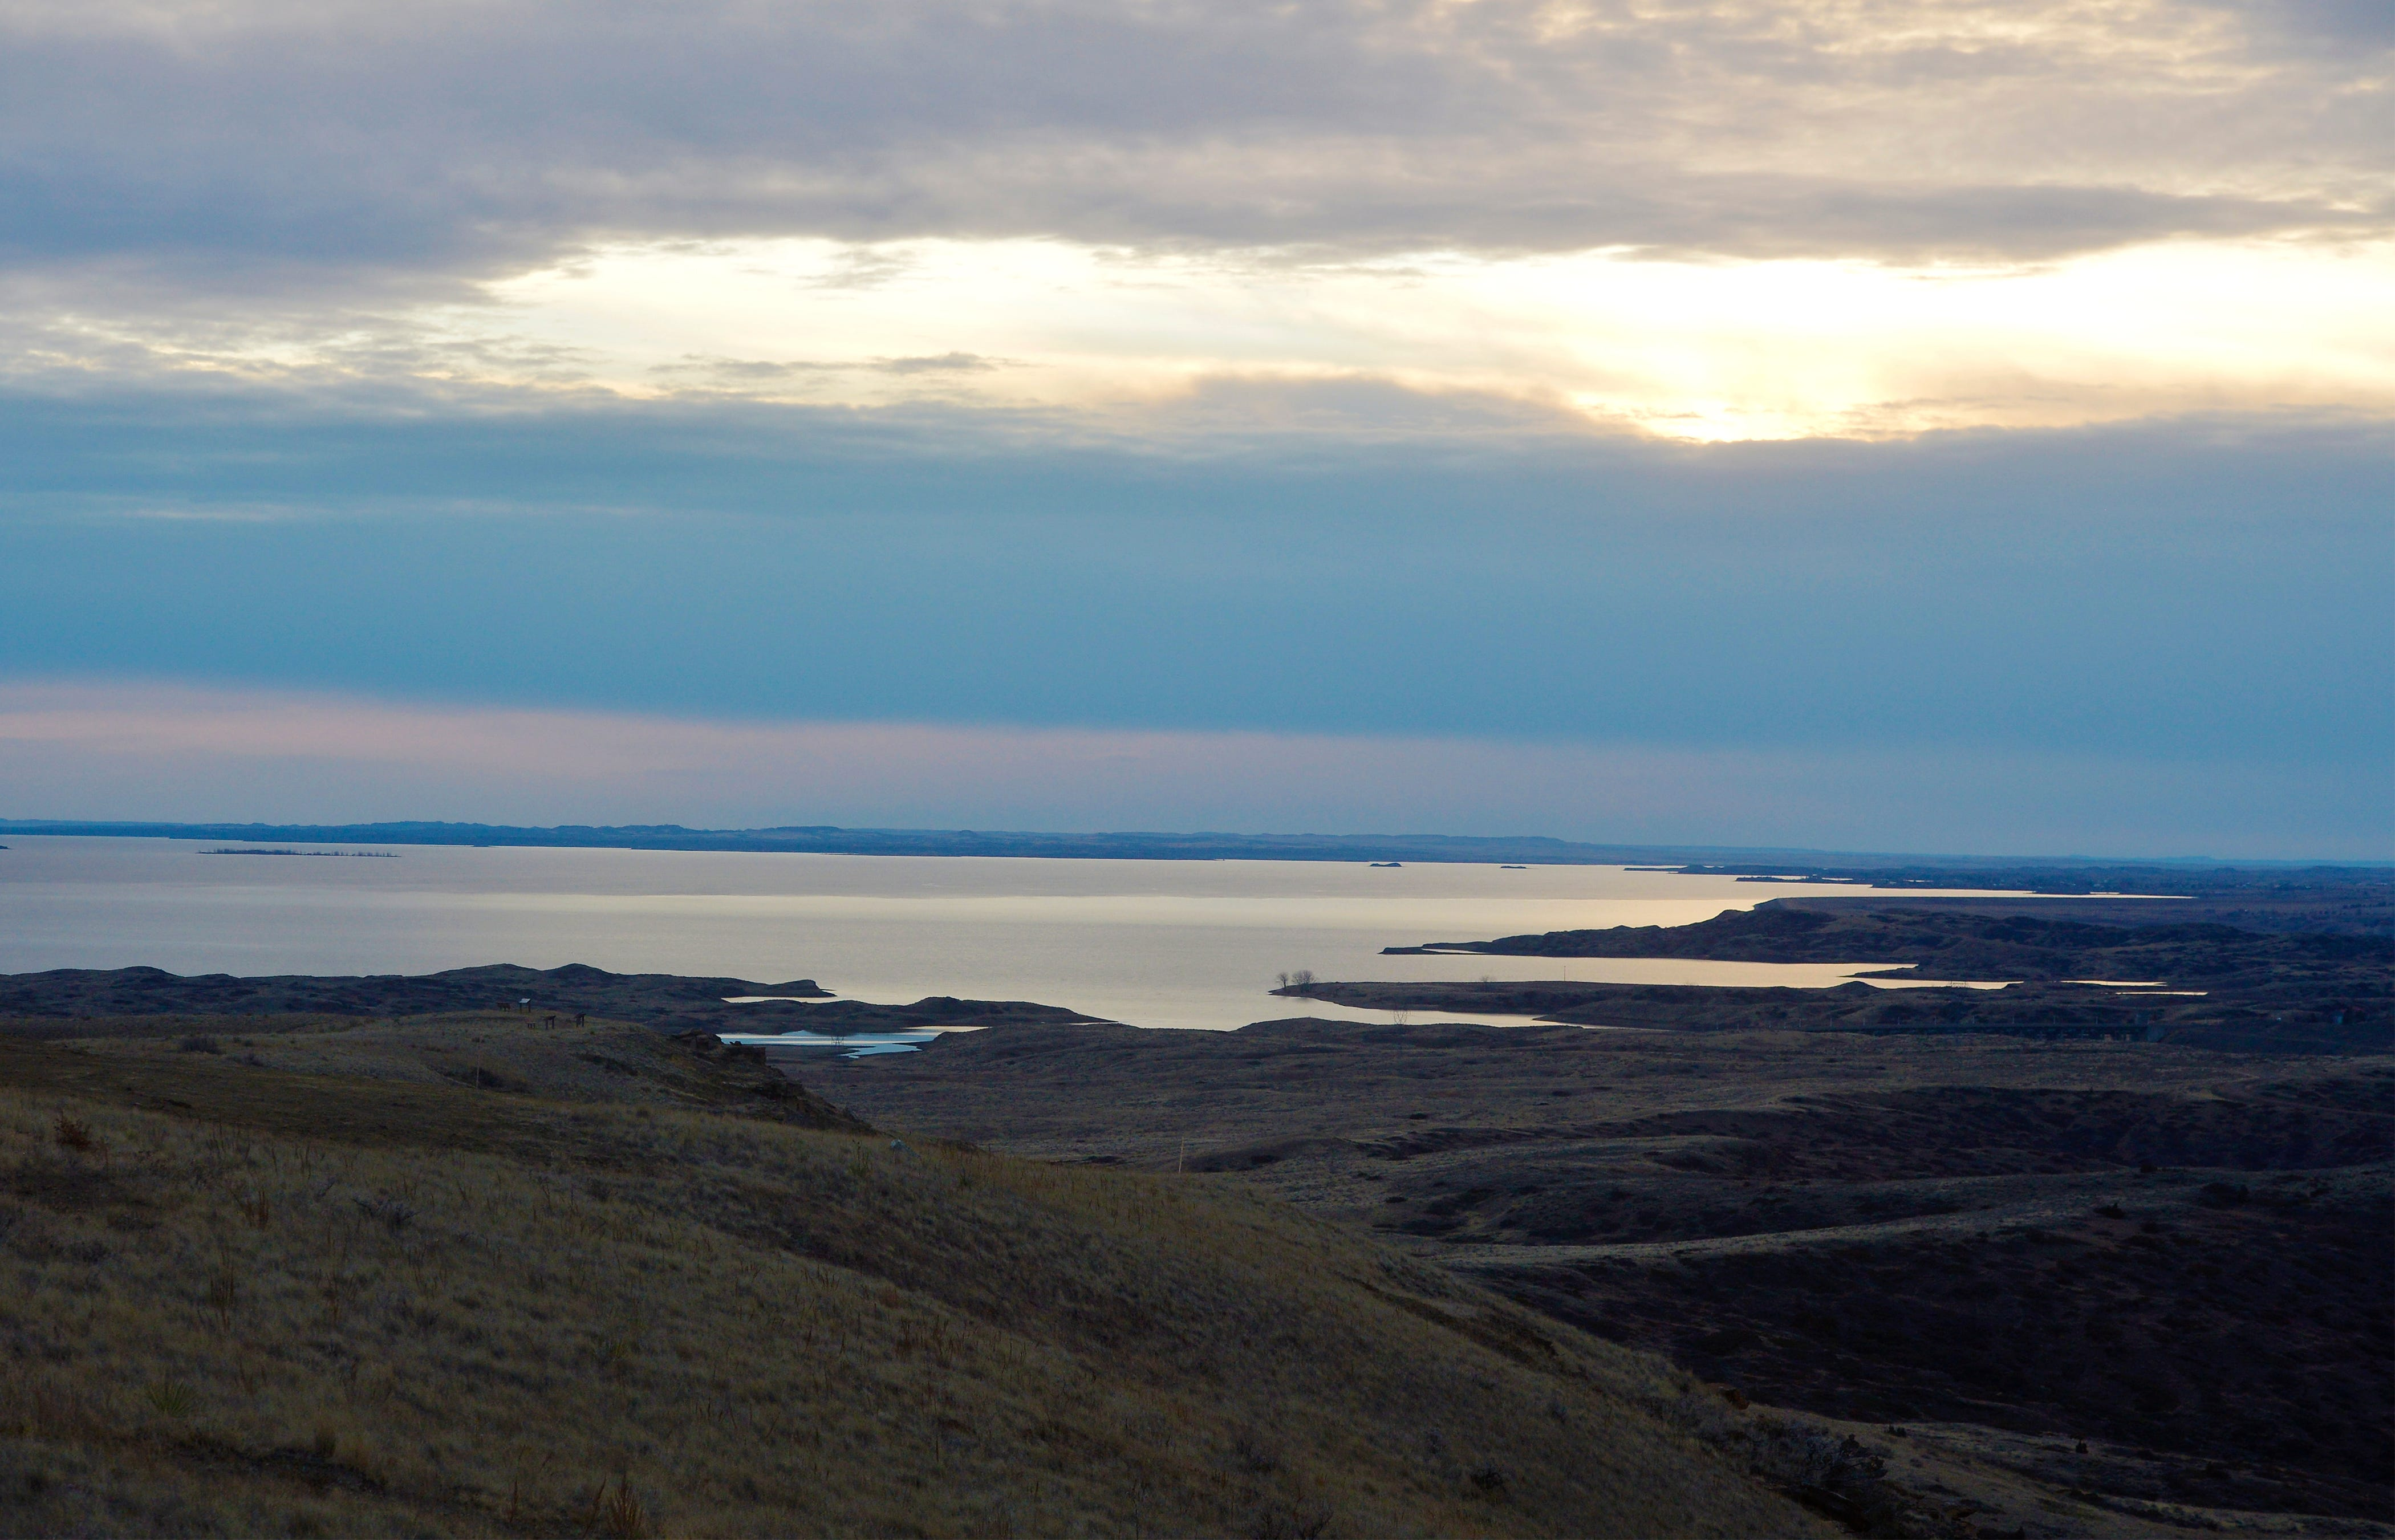 Fort Peck Lake.